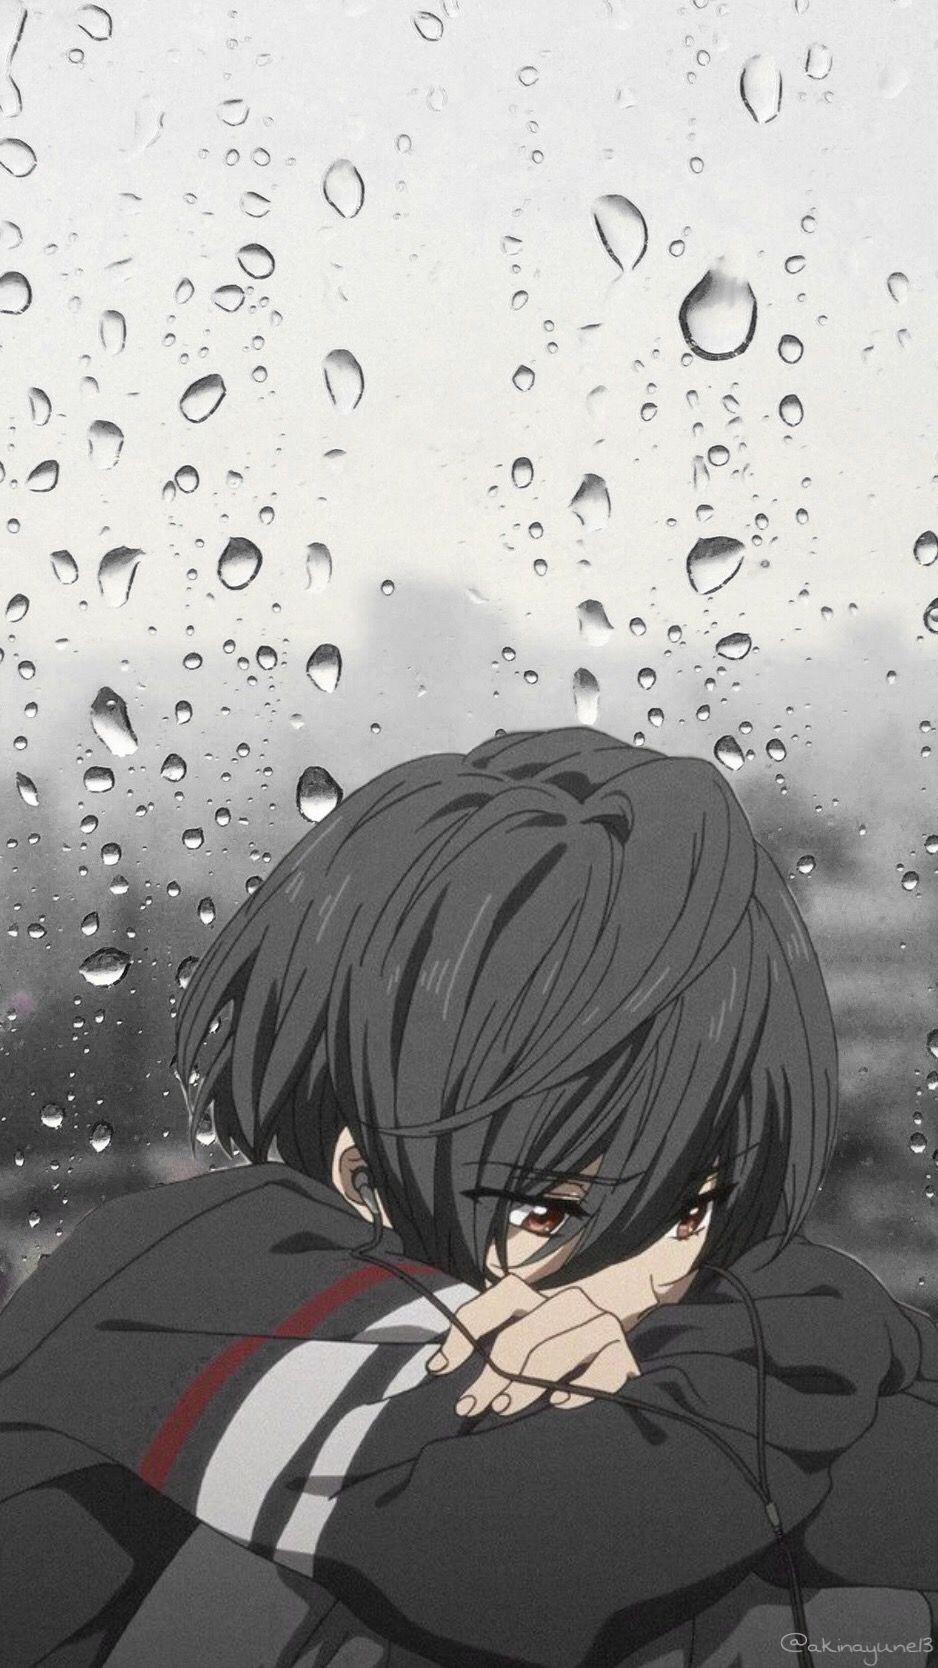 Boy Anime Sad : anime, Anime, Fanart, Wallpapers, Wallpaper